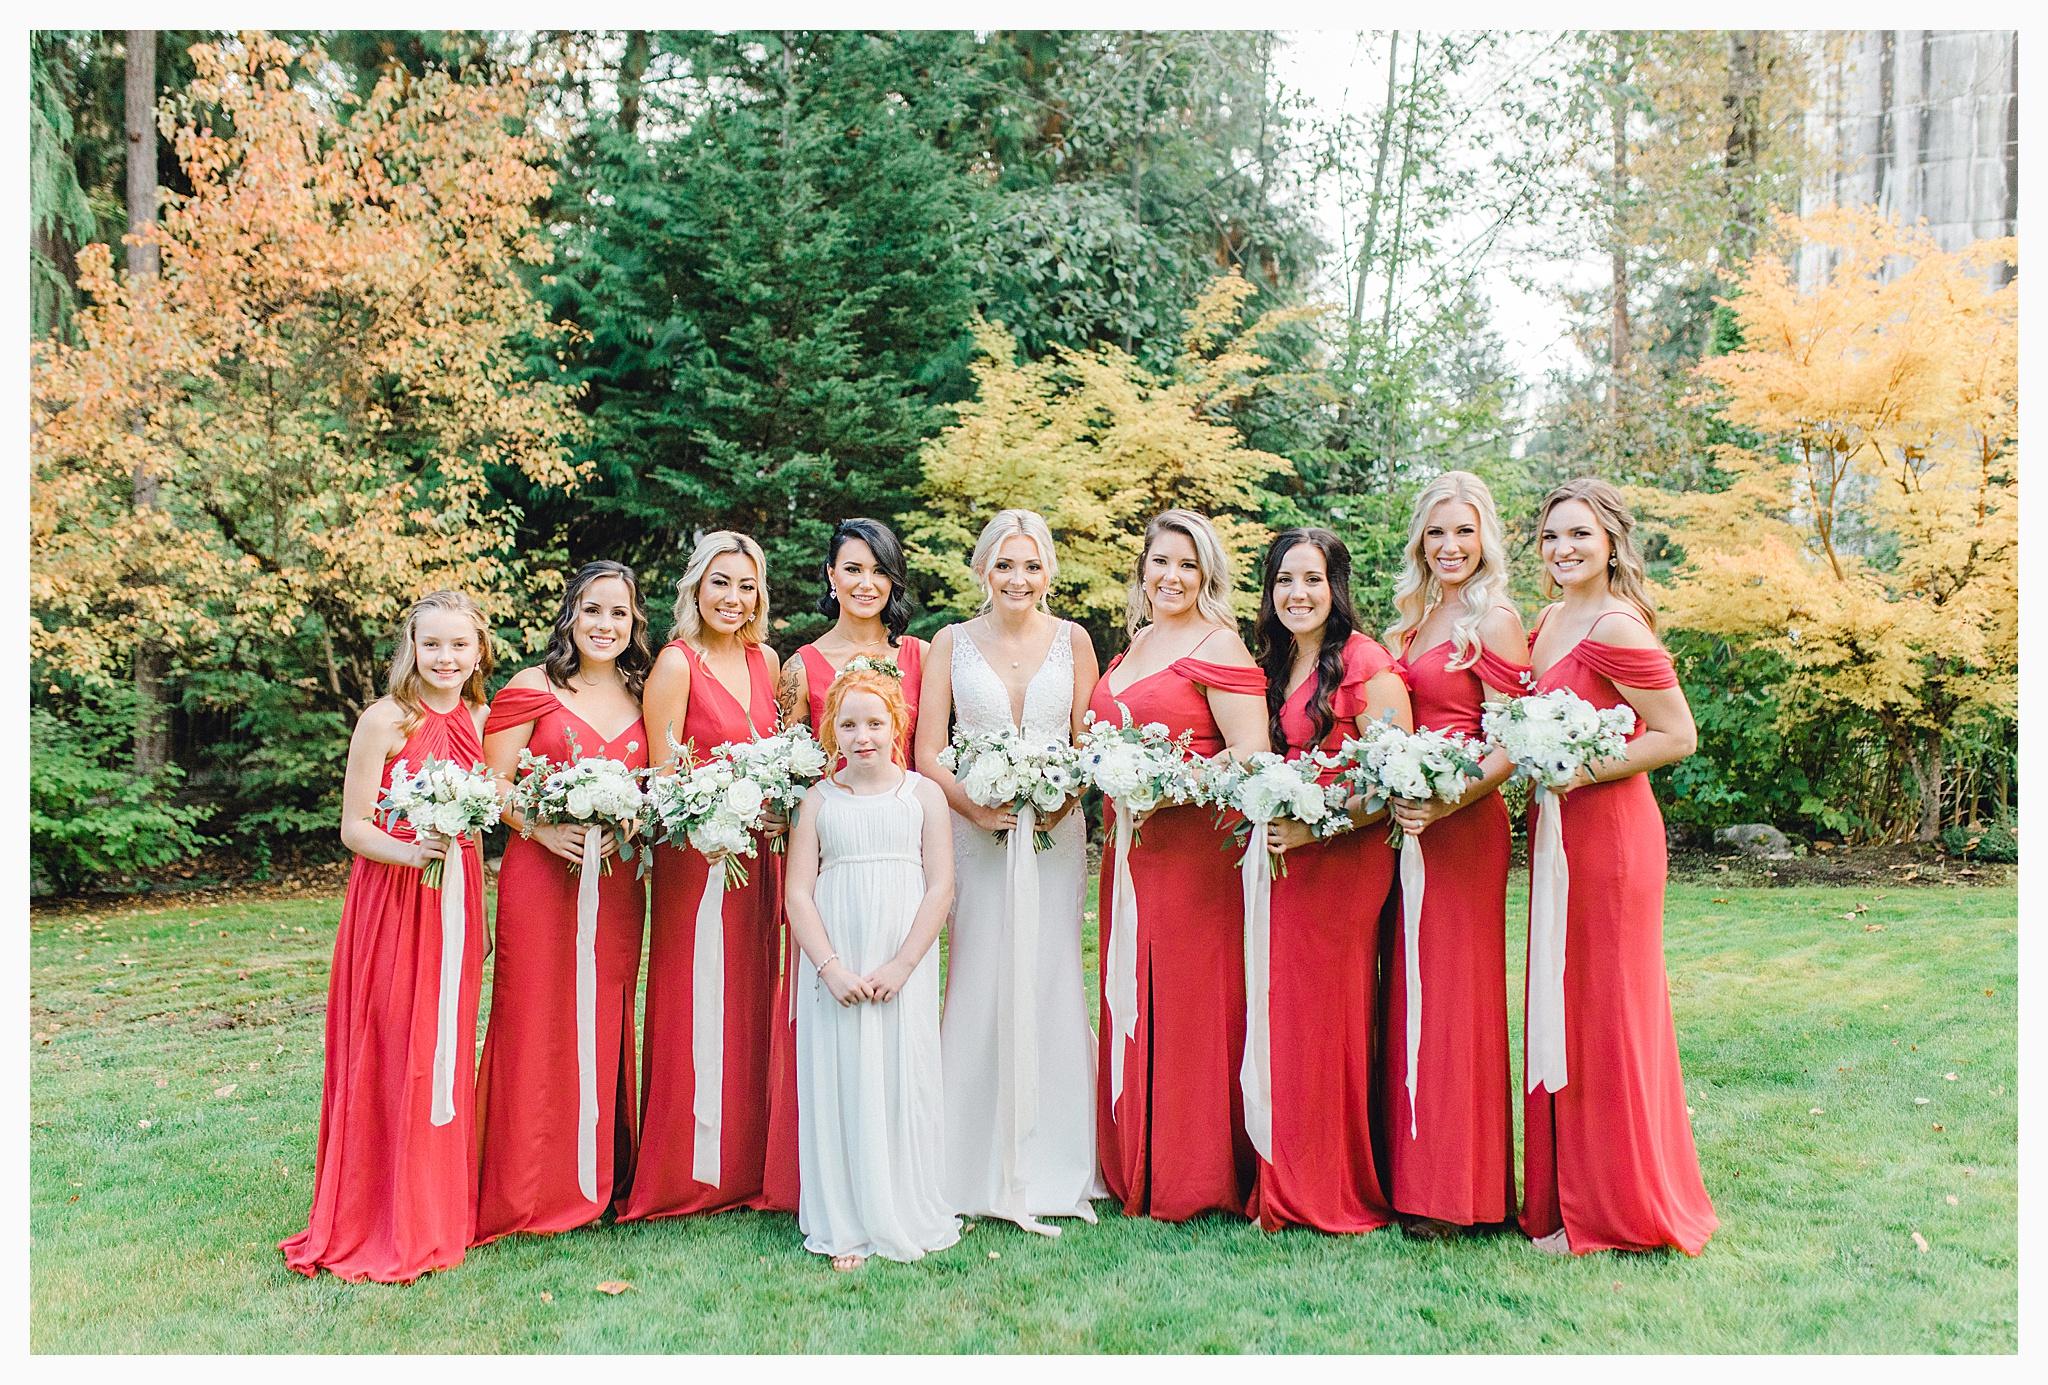 Emma Rose Company Light and Airy Wedding Photographer, Beautiful fall wedding at Rock Creek Gardens Venue in Puyallup, Washington._0051.jpg